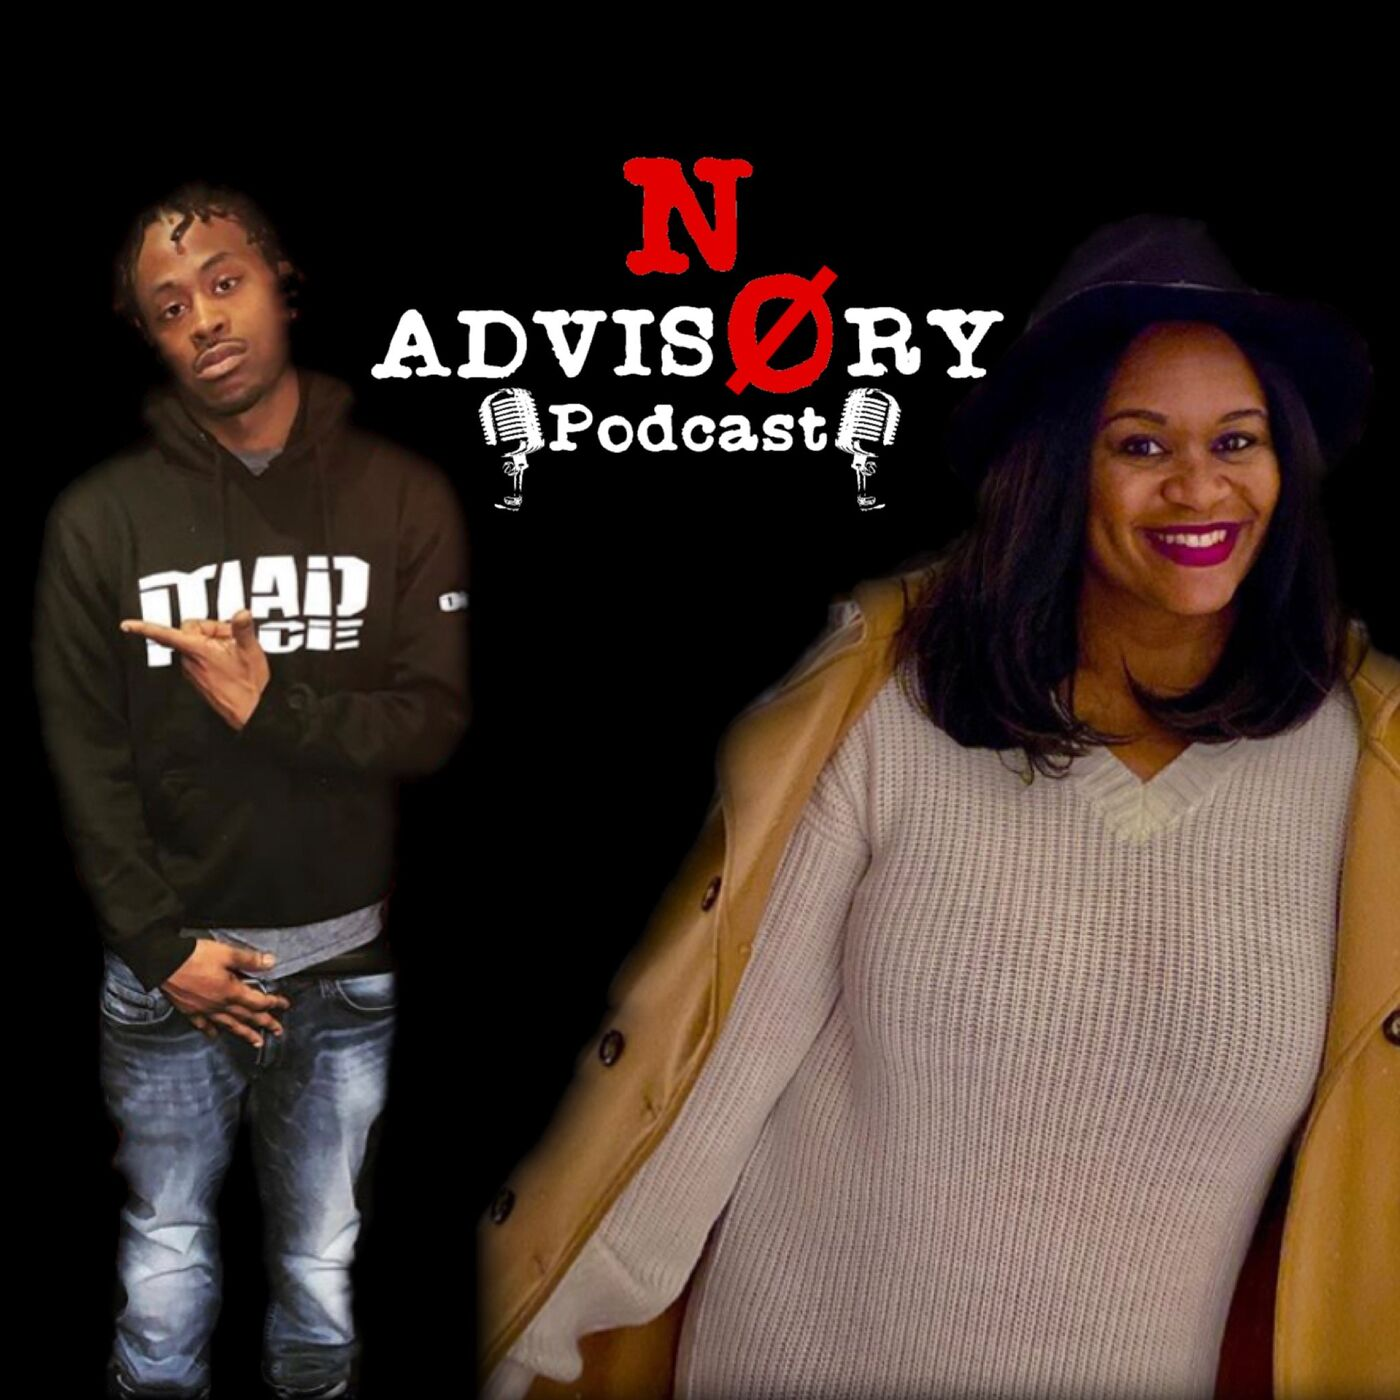 Exclusive Interview w/ Brokeandabroadlife w/ Artist of the week 6ambustarr